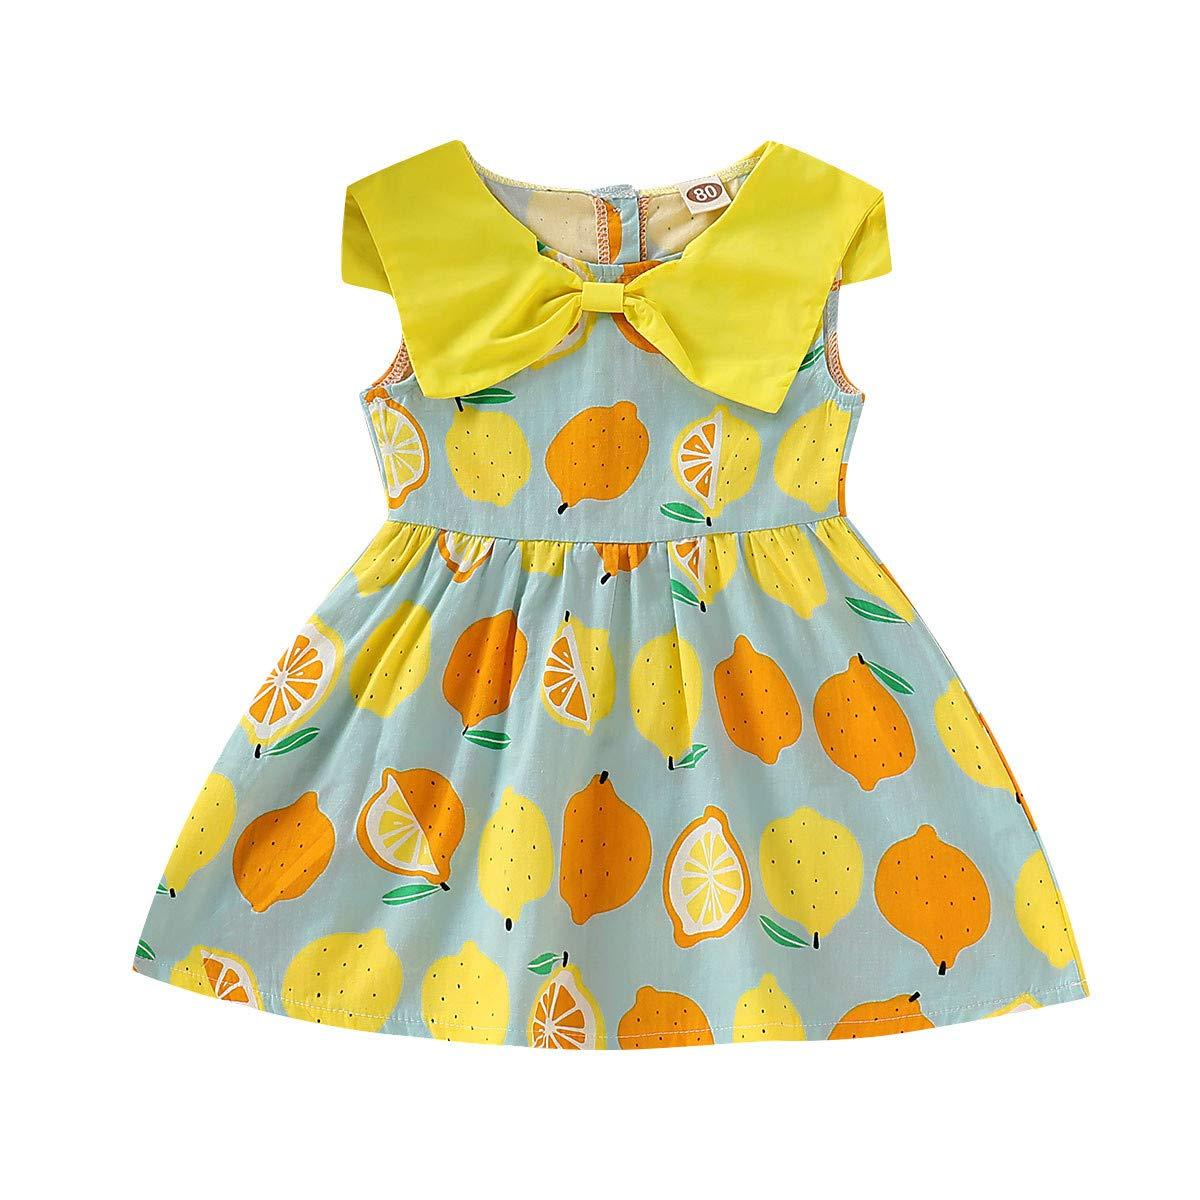 b1fb37cccb5 Amazon.com: Iuhan Girls Sundresses Summer 2019 Toddler Kid Baby Girl ...